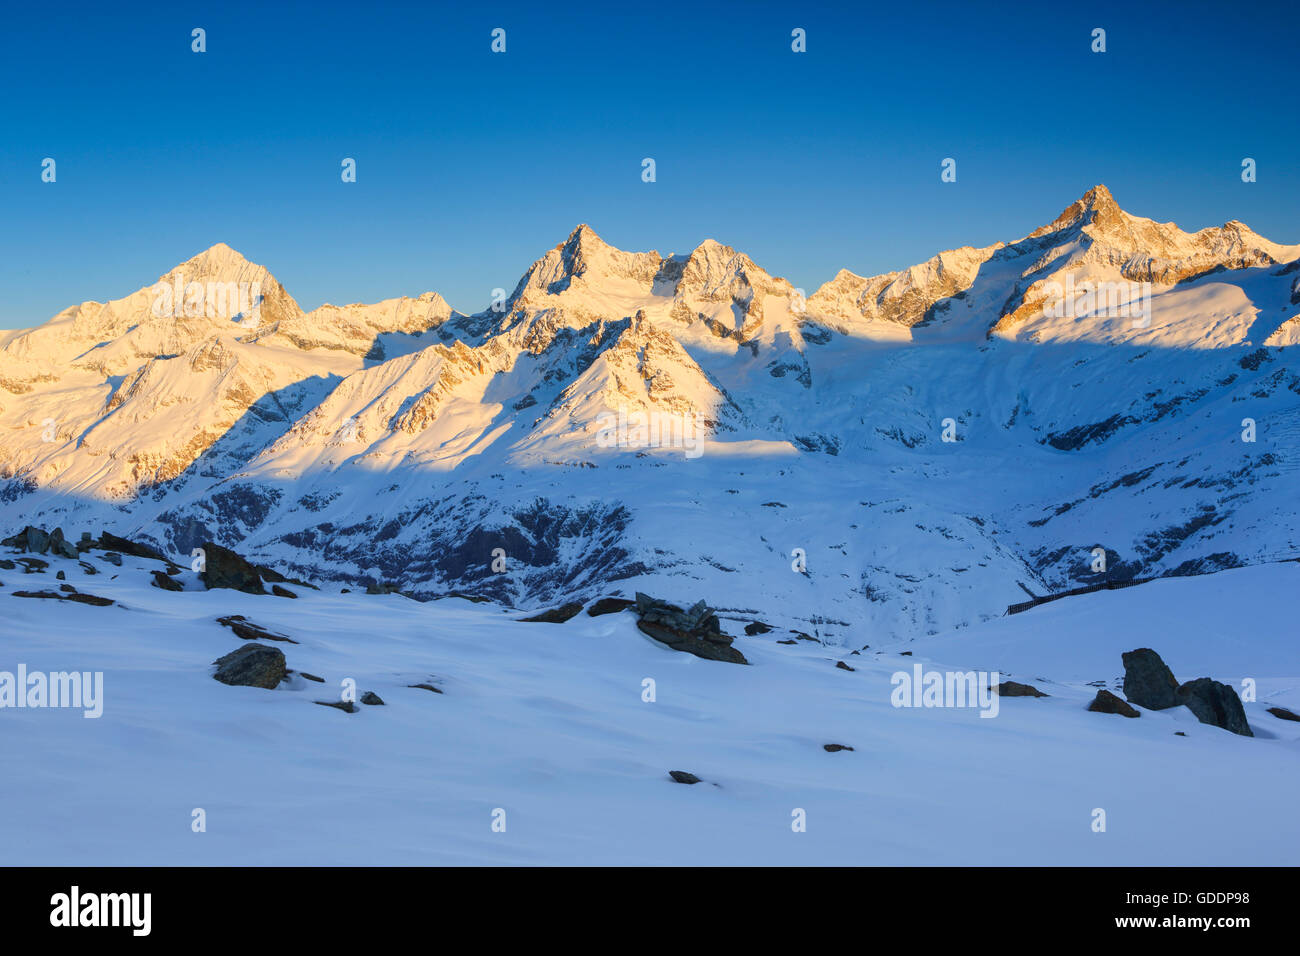 Dent Blanche - 4357 ms,Ober Gabelhorn - 4063 ms,Zinalrothorn - 4221 ms,Valais,Switzerland Stock Photo